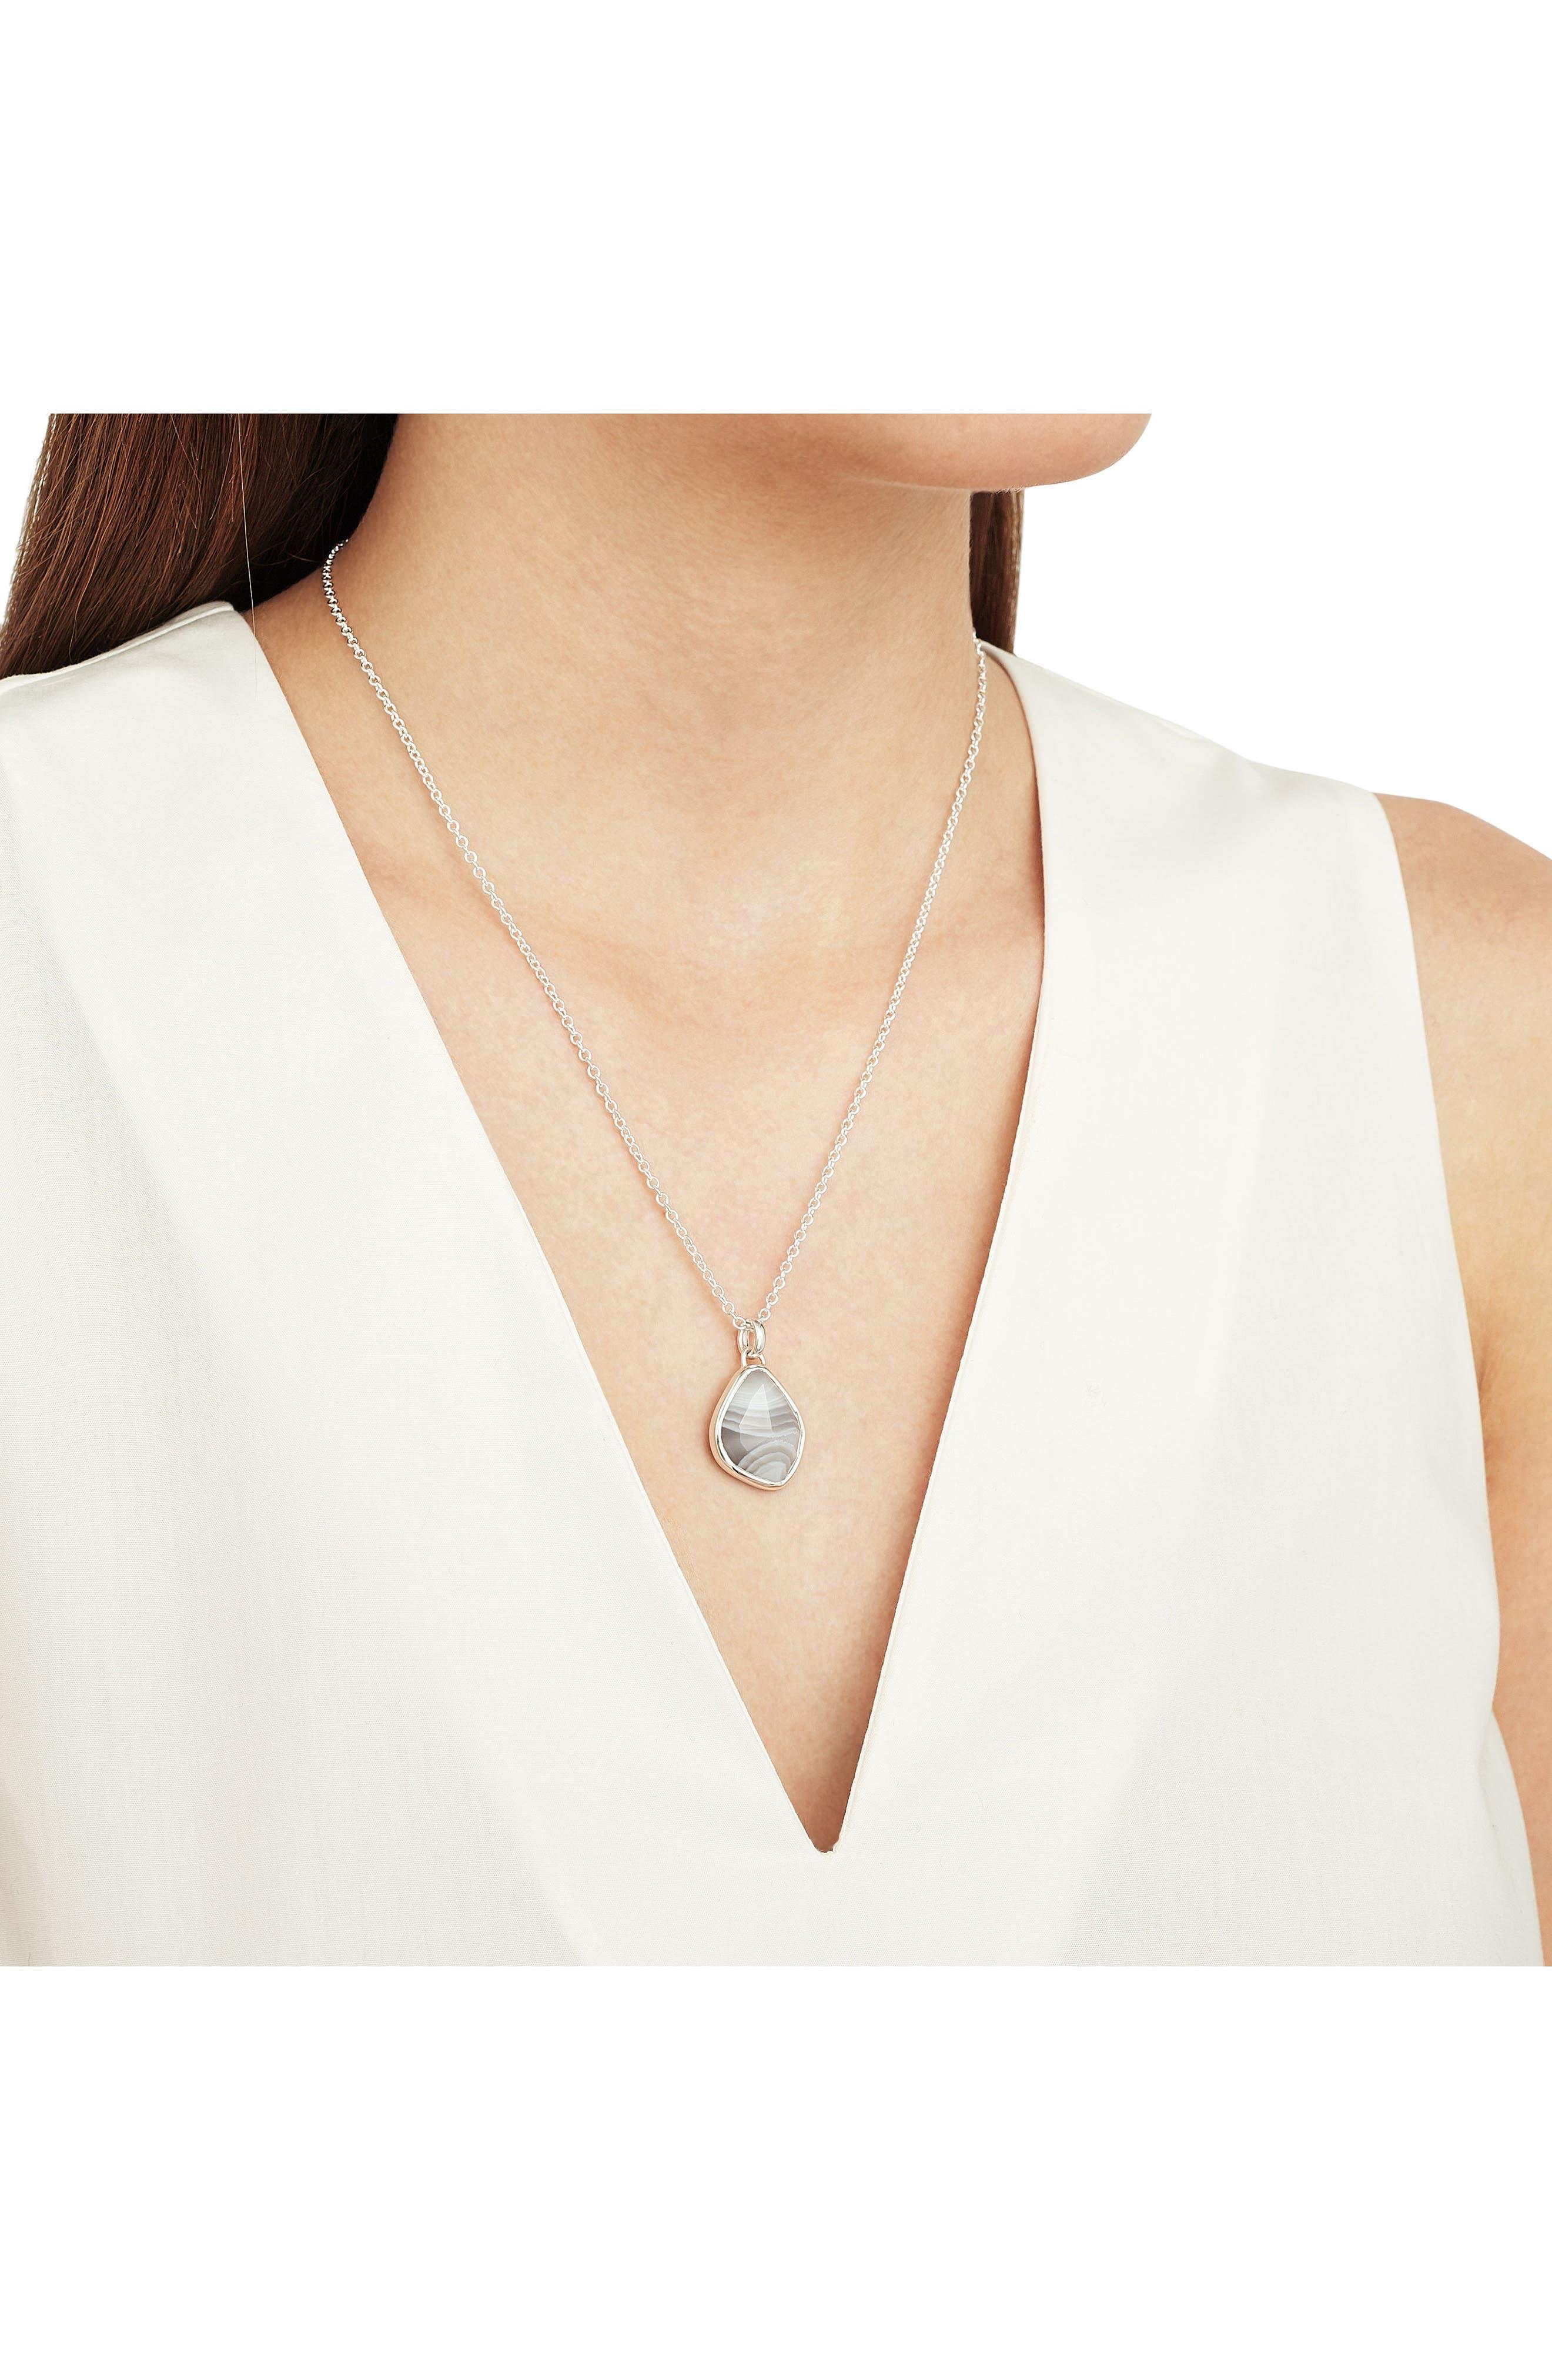 Siren Nugget Semiprecious Stone Pendant Charm,                             Alternate thumbnail 2, color,                             040